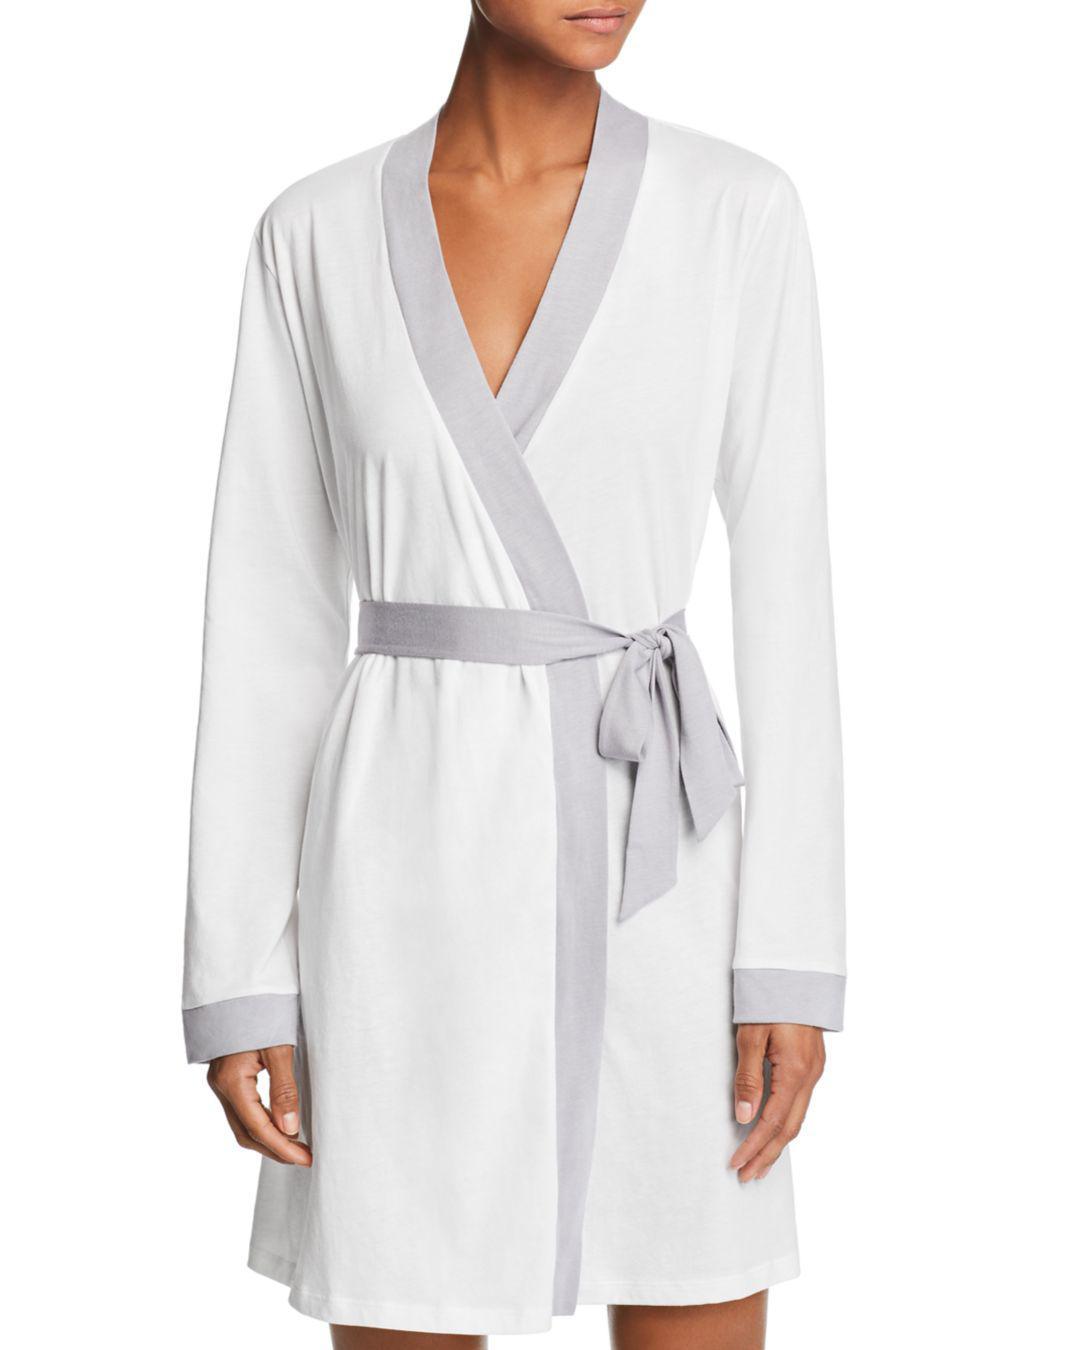 70b1cede46 Lyst - Cosabella Bella Robe in White